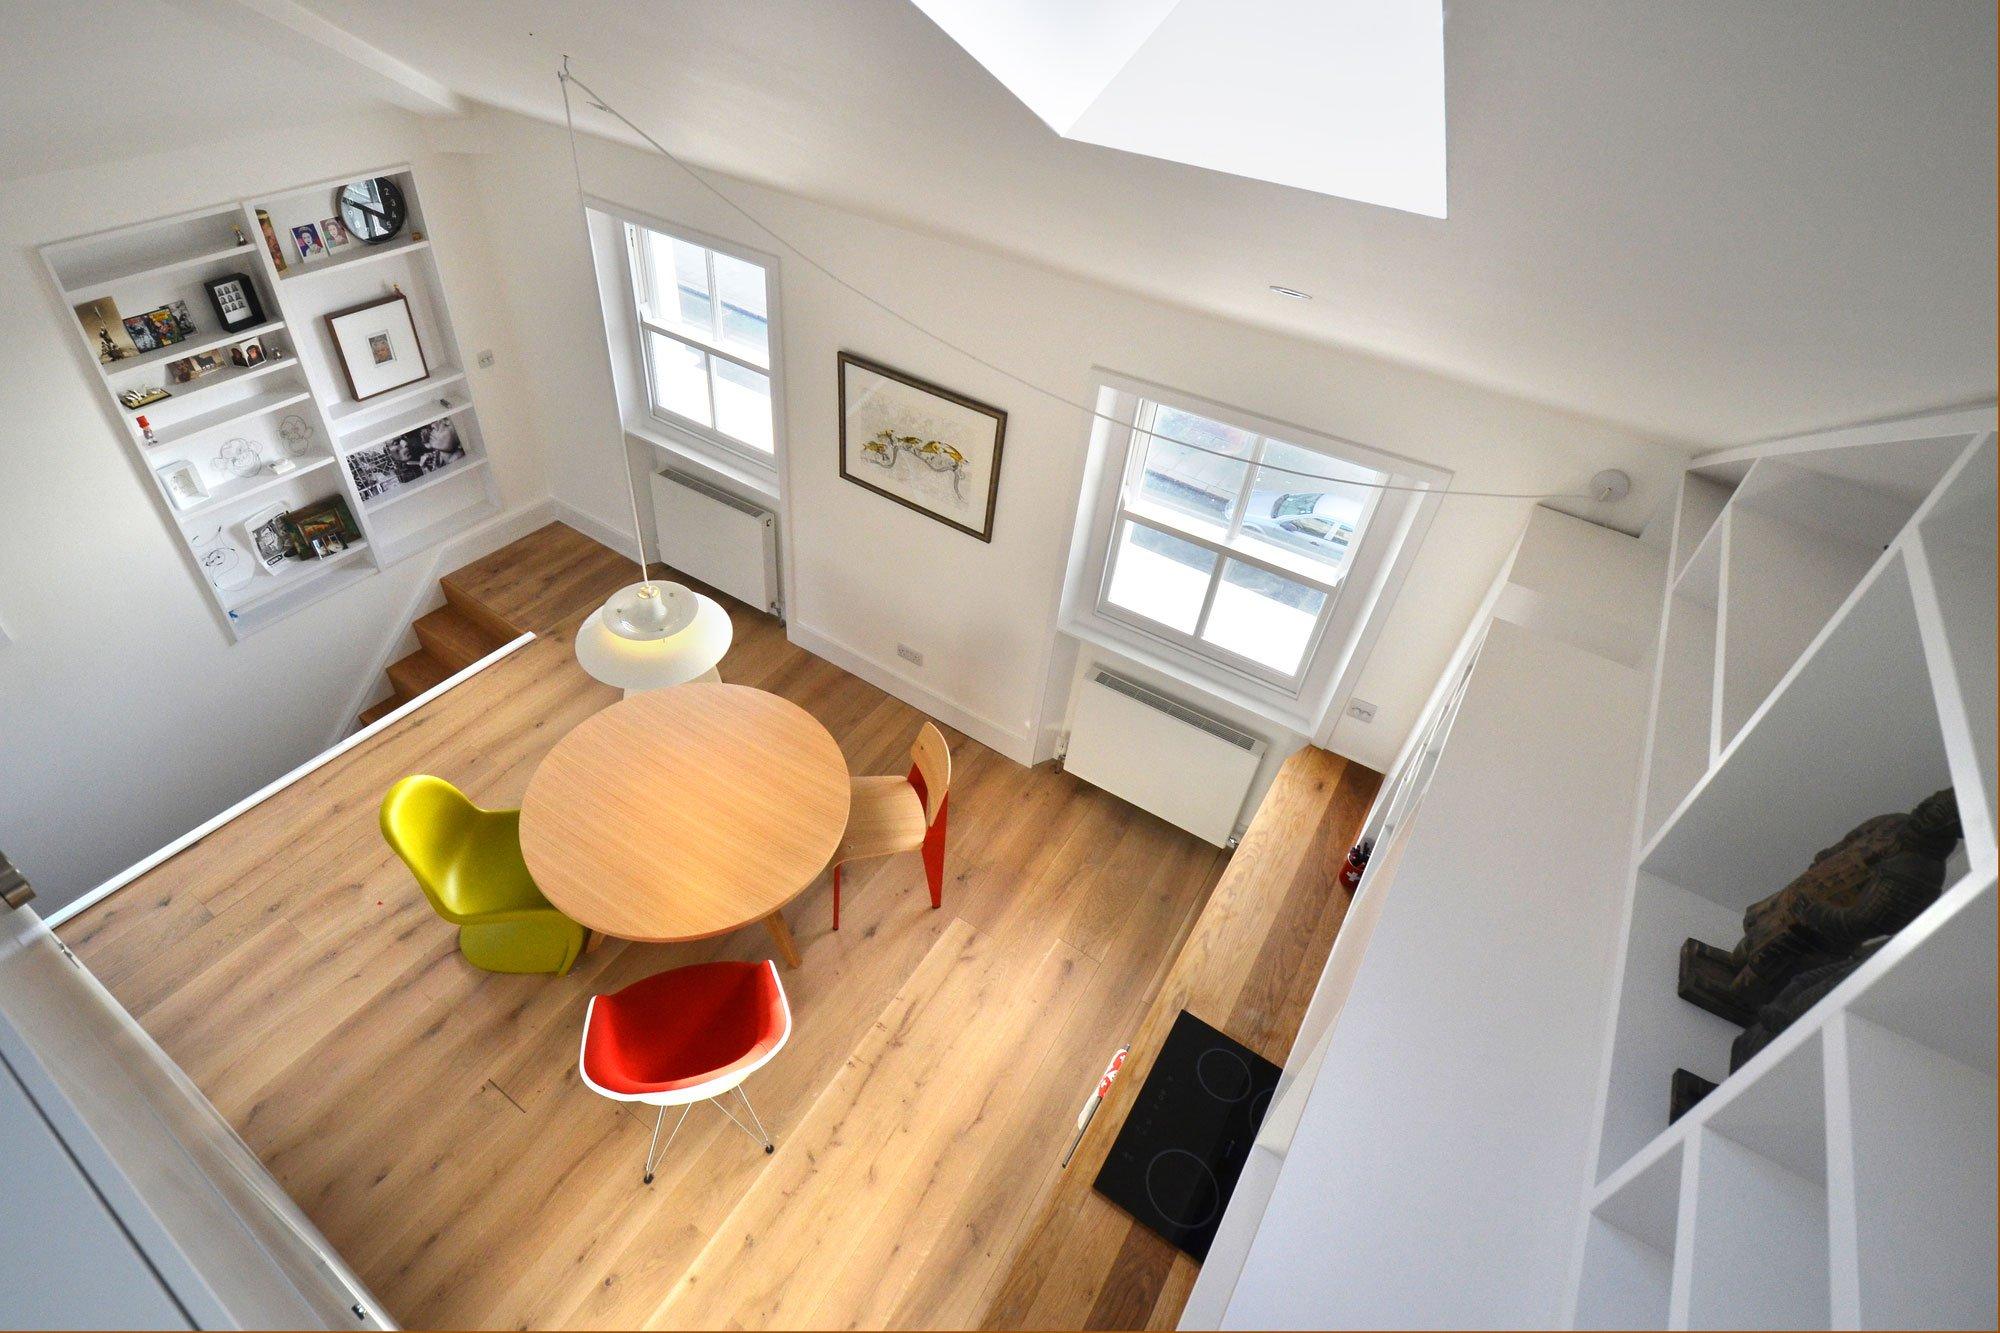 loft-space-in-camden-01